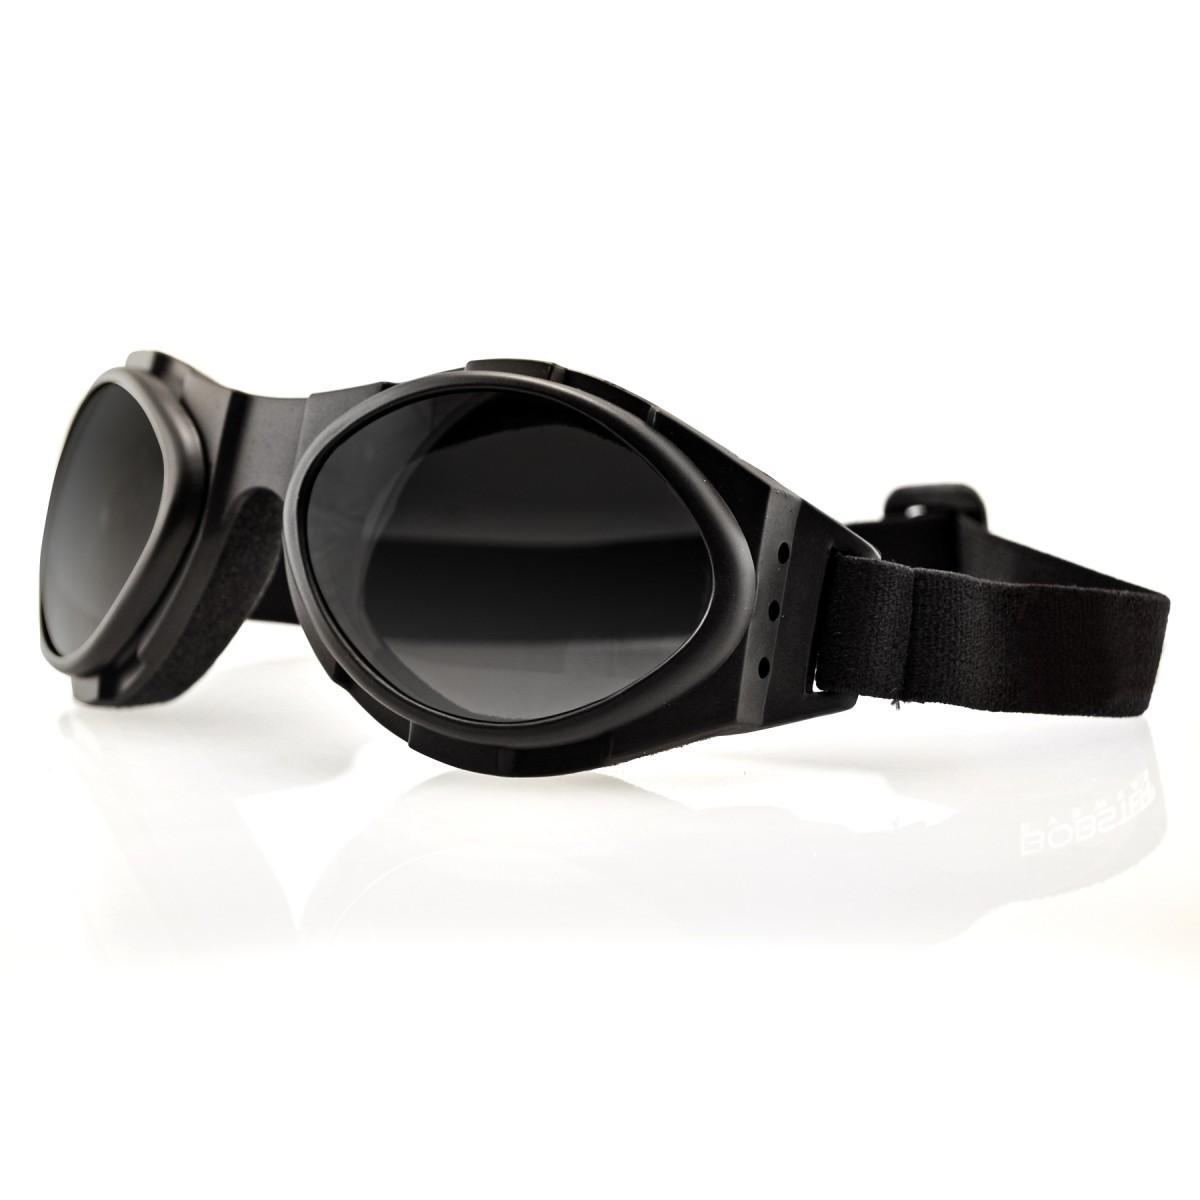 Bobster Eyewear PILOT Unisex-Adult Goggles Black Frame//Smoke Lens, One BPIL001